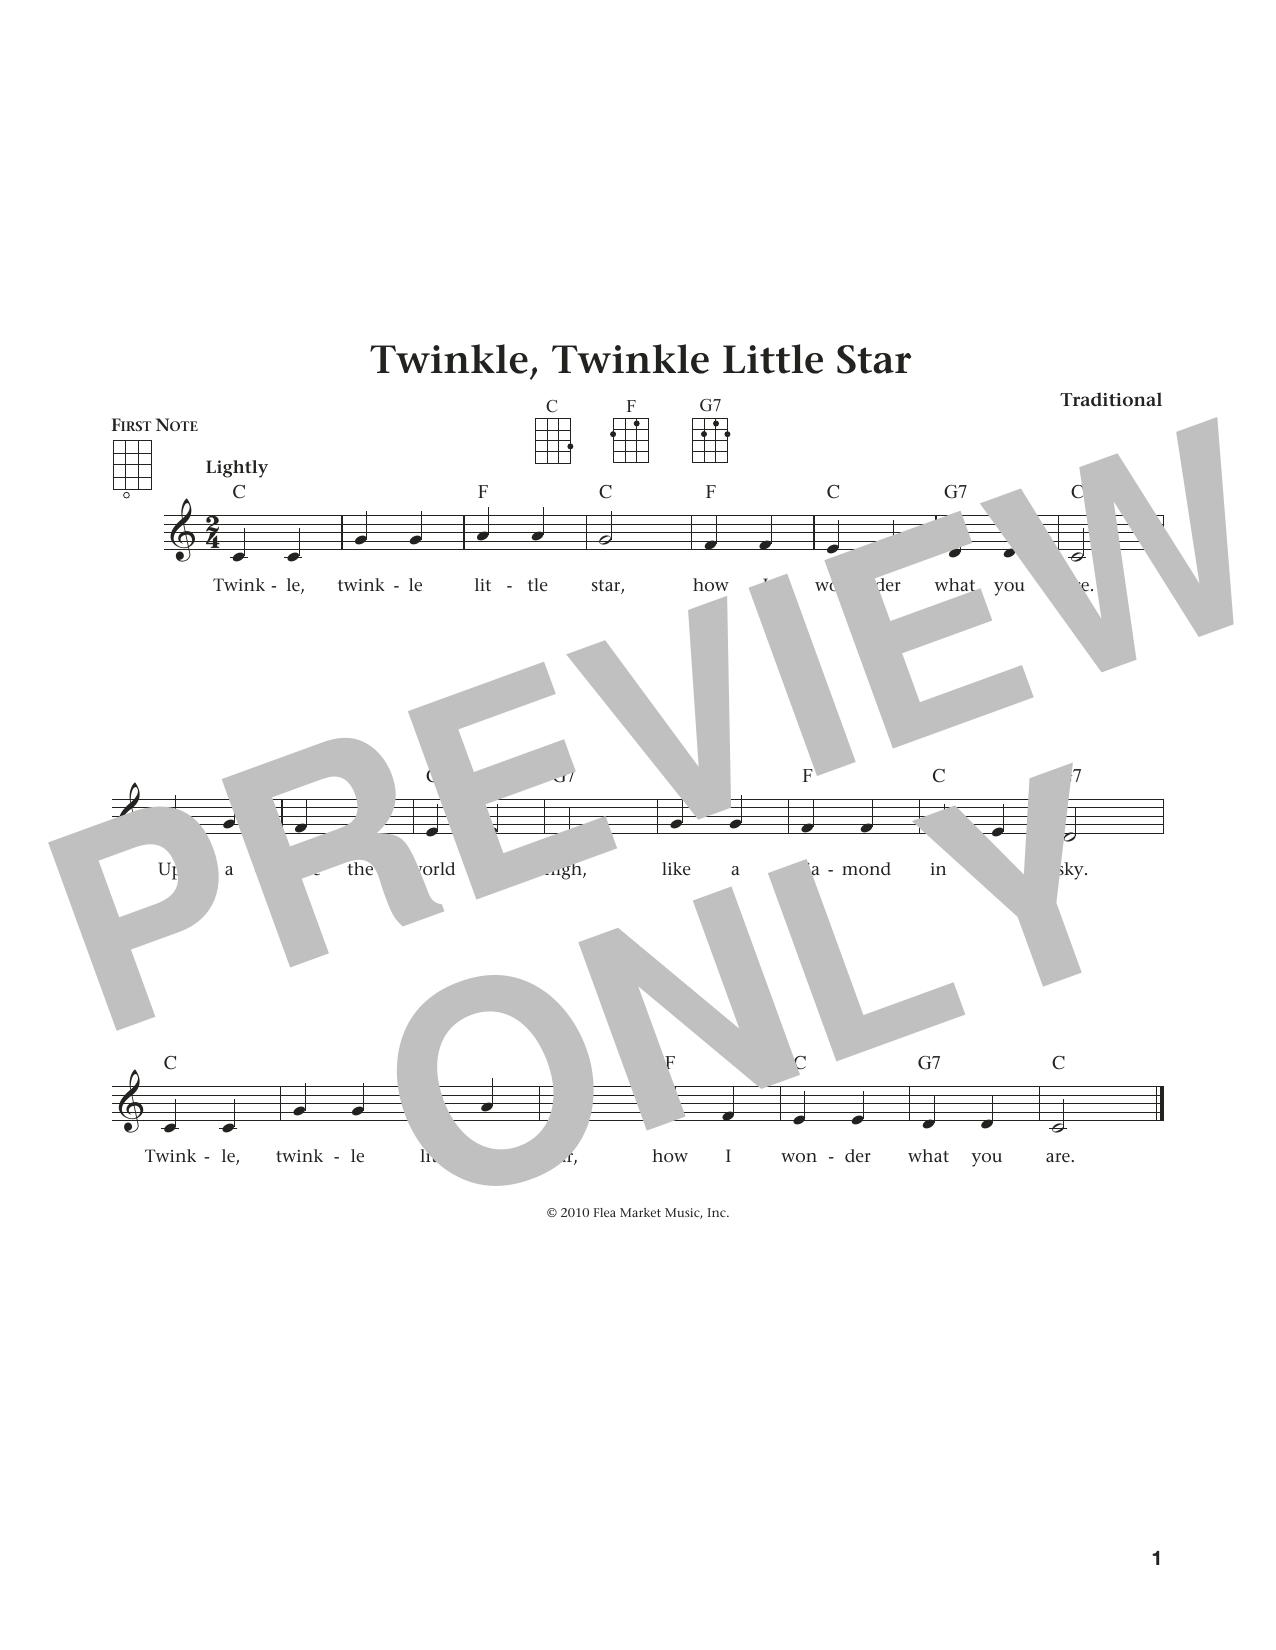 Twinkle, Twinkle Little Star (from The Daily Ukulele) (arr. Liz and Jim Beloff) (Ukulele)